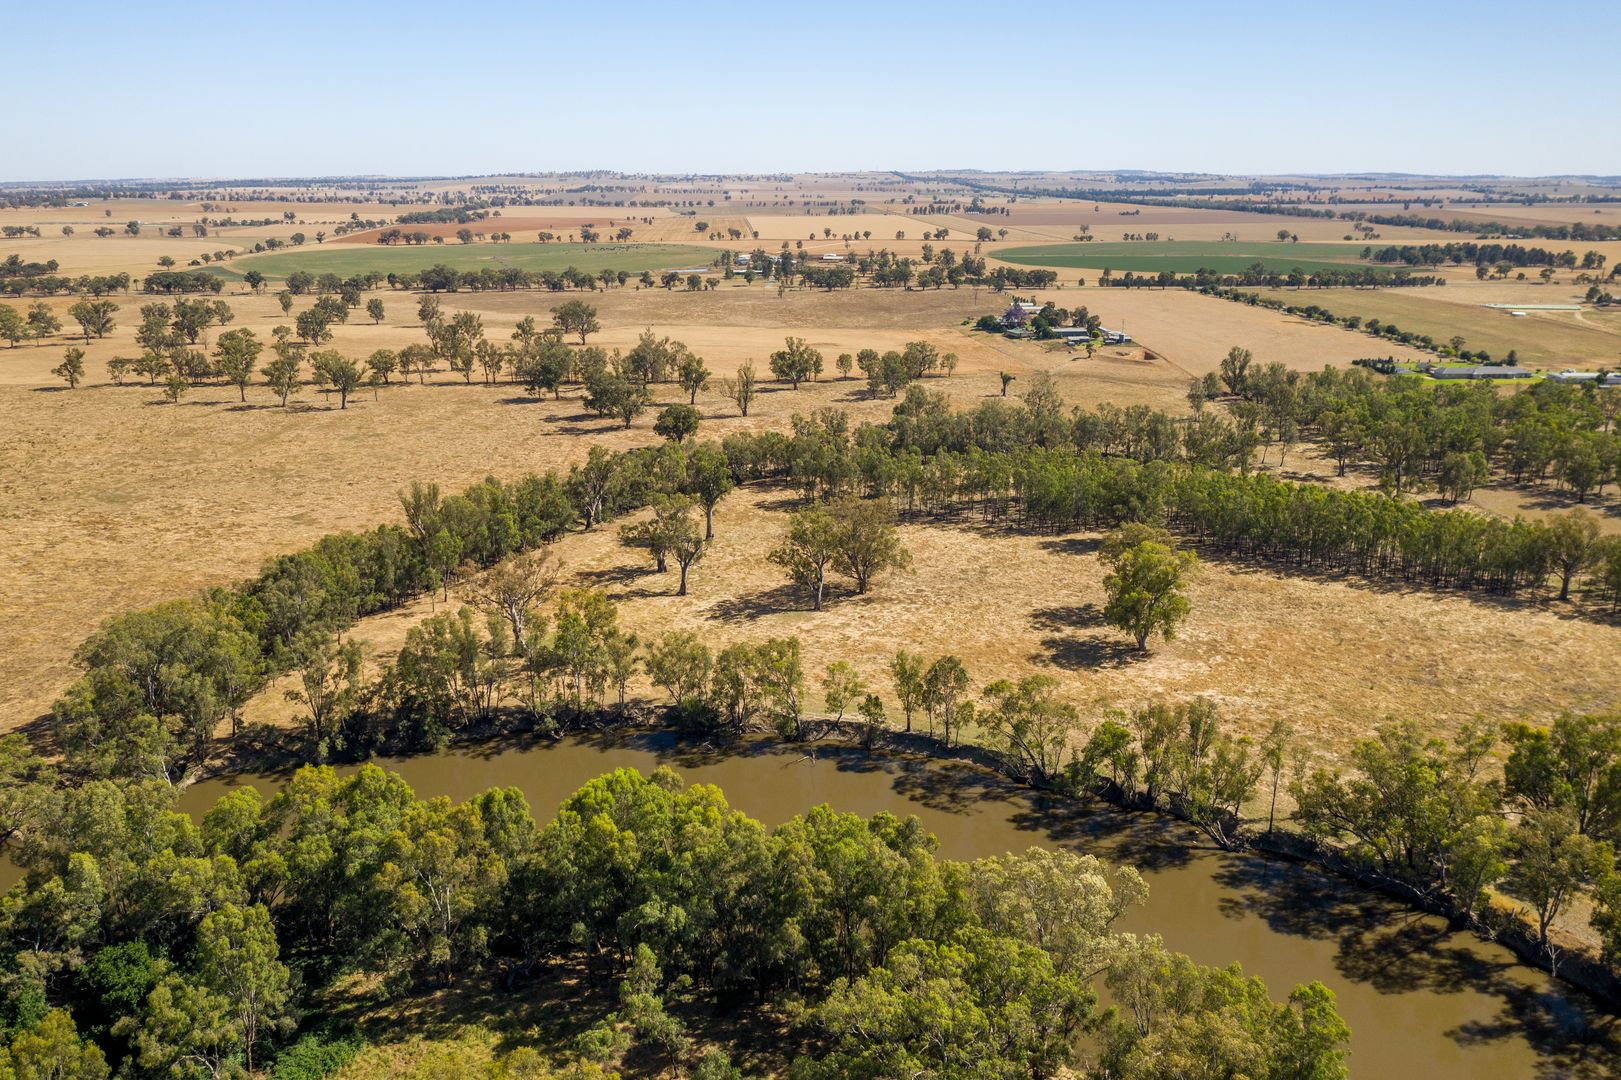 2239 OLD NARRANDERA ROAD, CURRAWARNA VIA, Wagga Wagga NSW 2650, Image 1